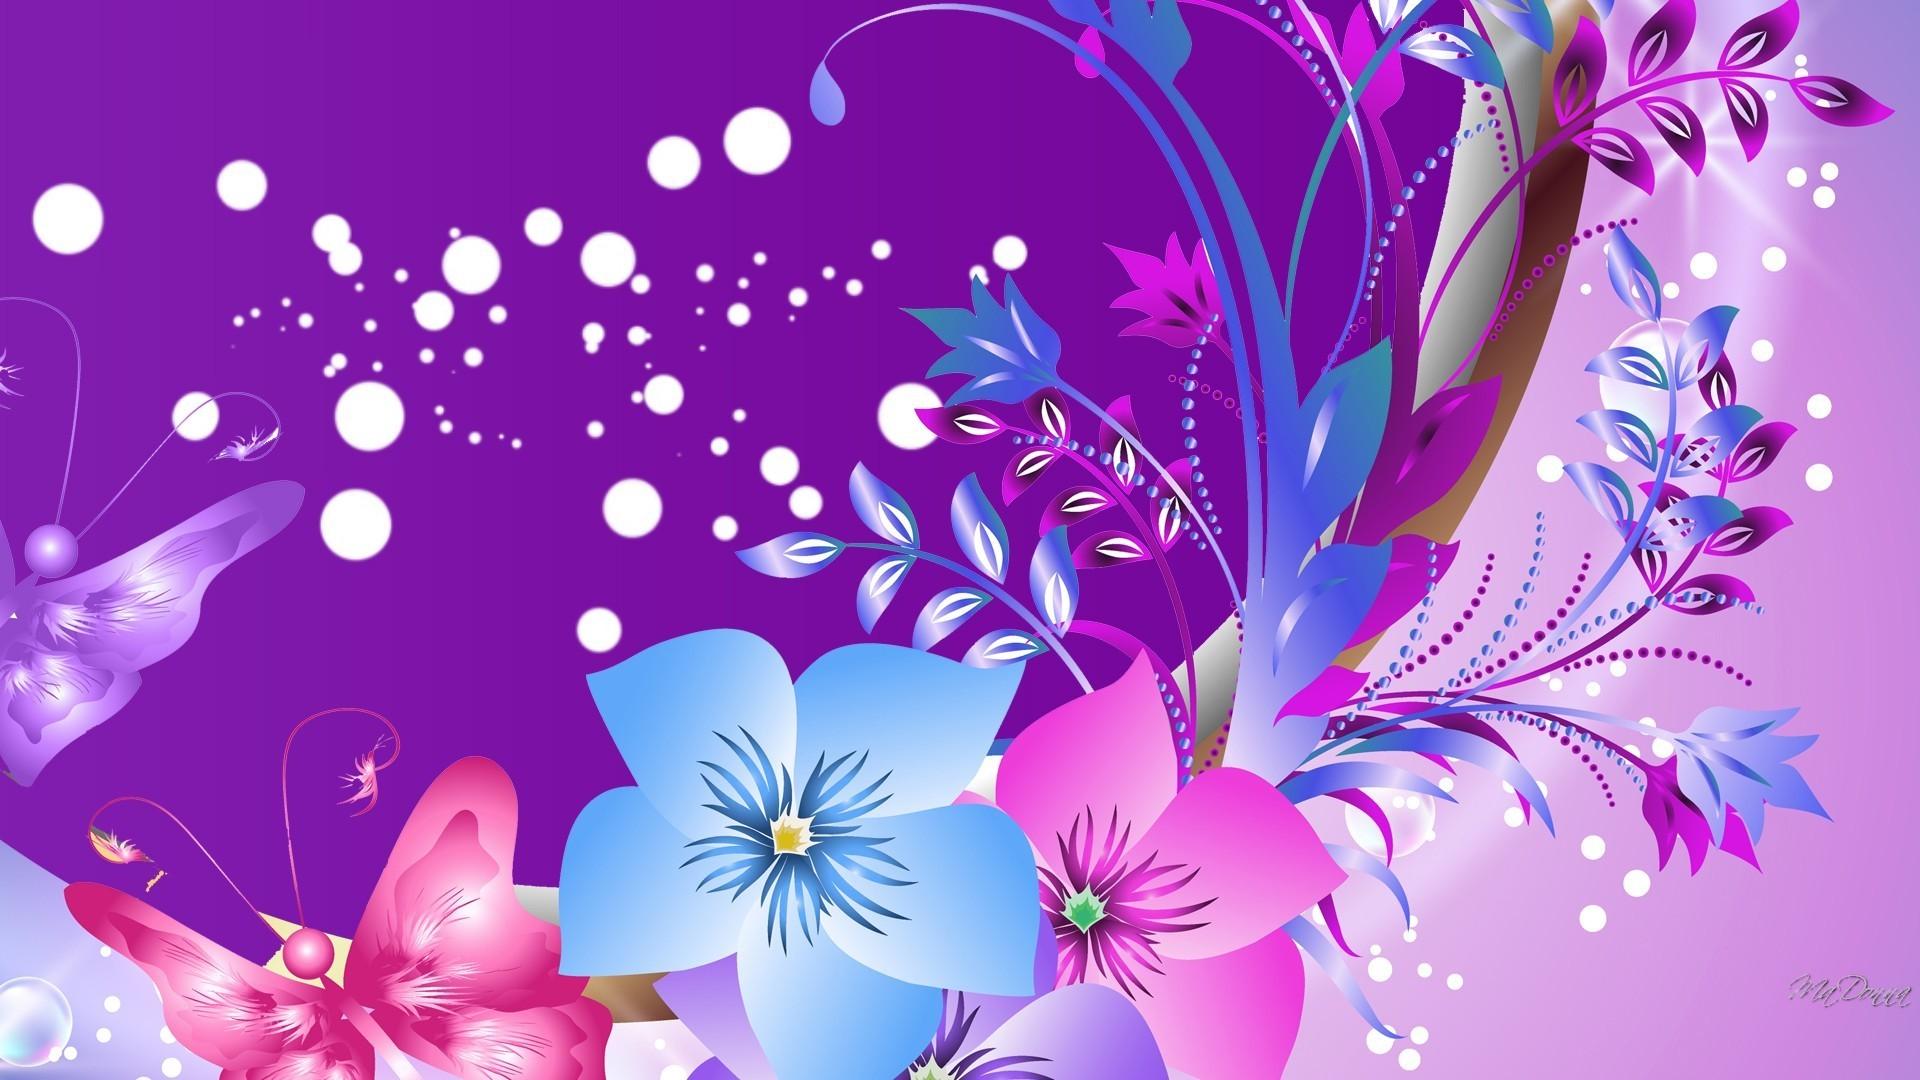 Butterflies Tag – Summer Purple Dots Butterflies Abstract Pink Flowers  Flower Screen Wallpapers for HD 16